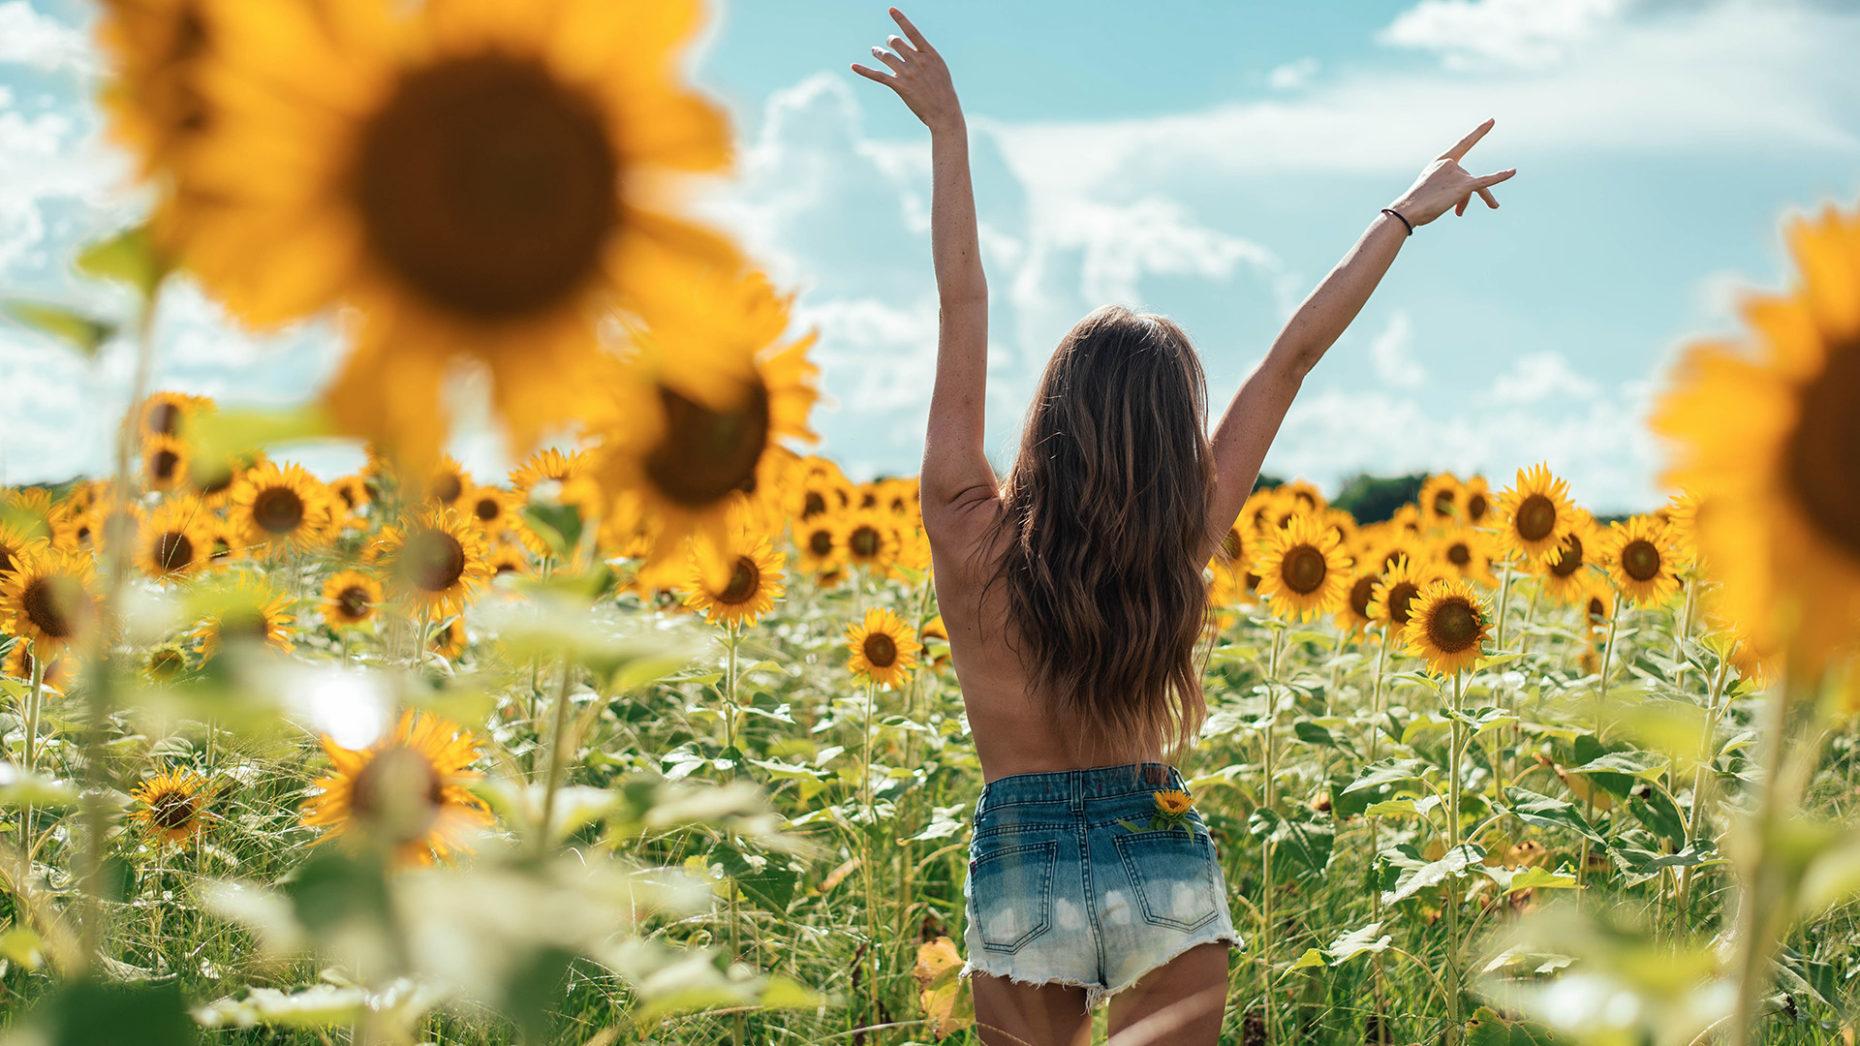 Sunflower Desktop Wallpaper Posted By Ryan Peltier